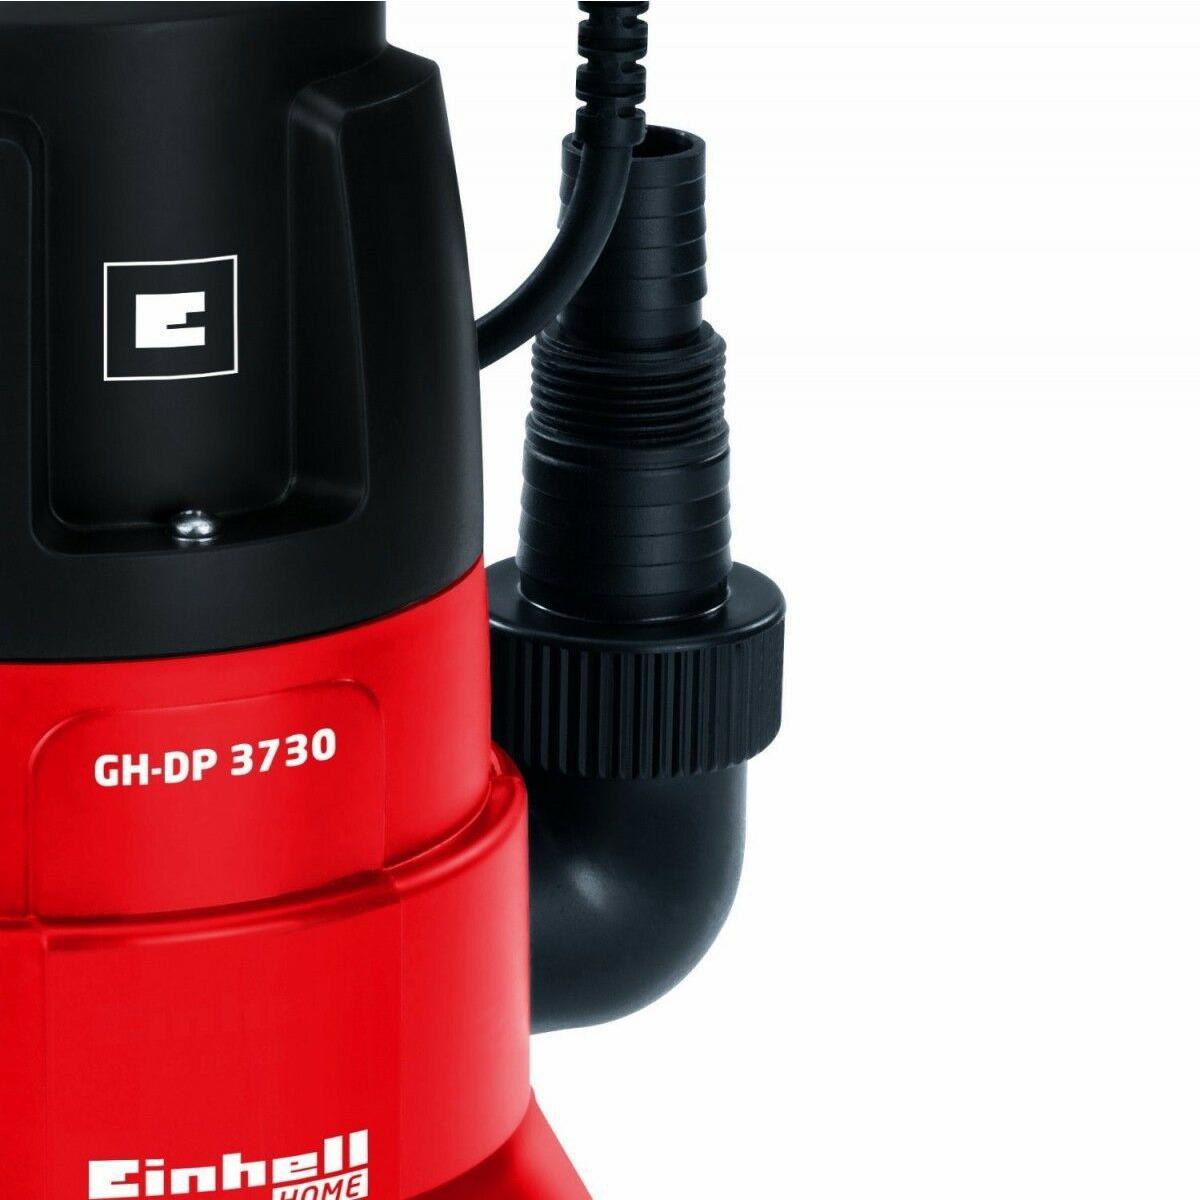 elettropompa da 370 W Pompa sommersa elettrica acque scure Einhell GH-DP 3730